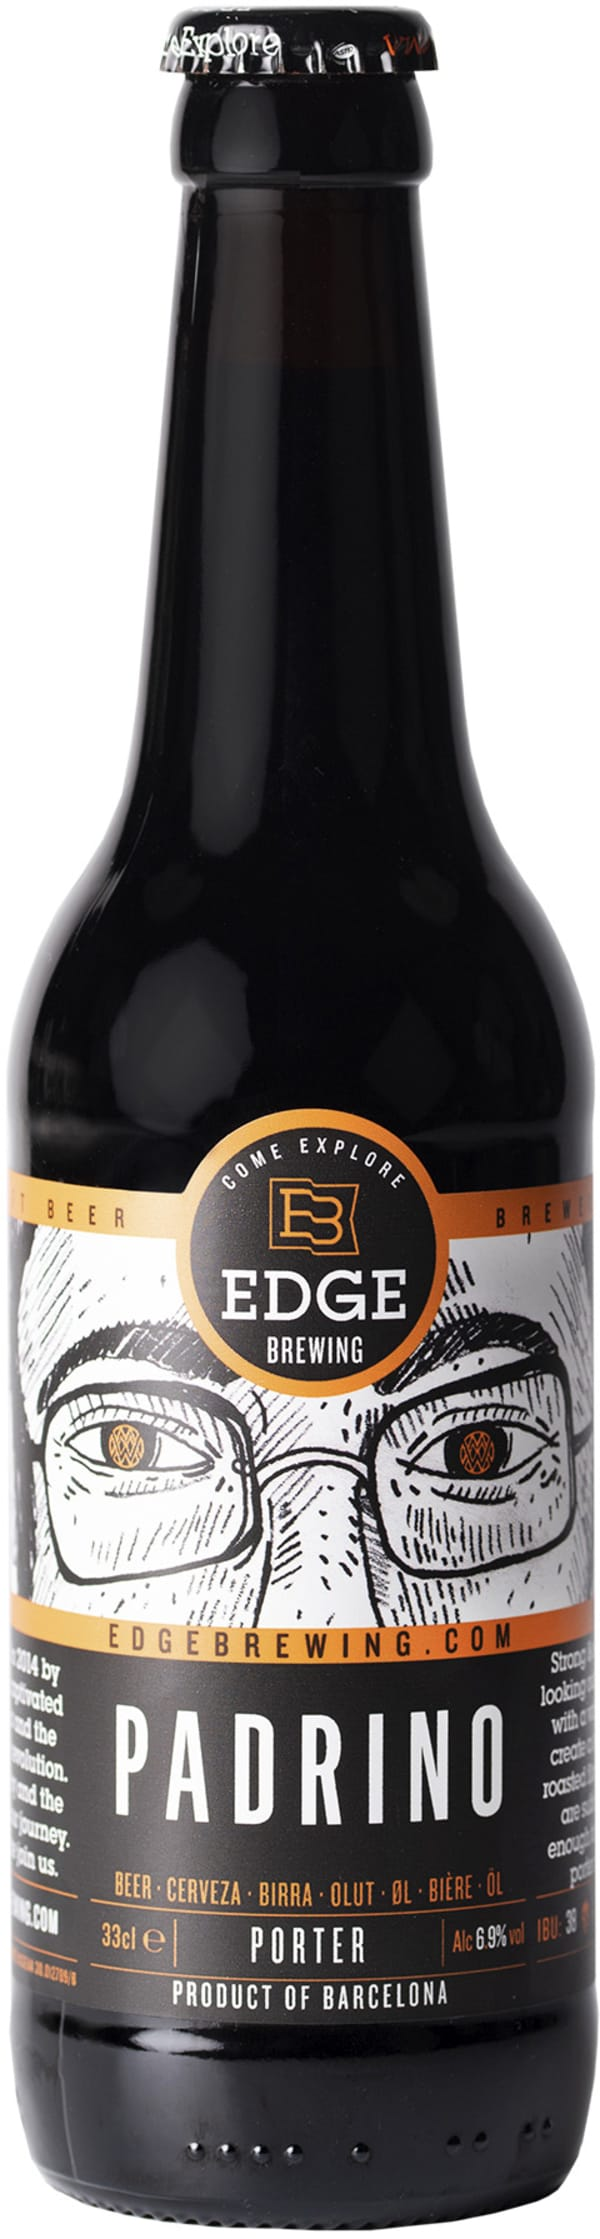 Edge Padrino Porter